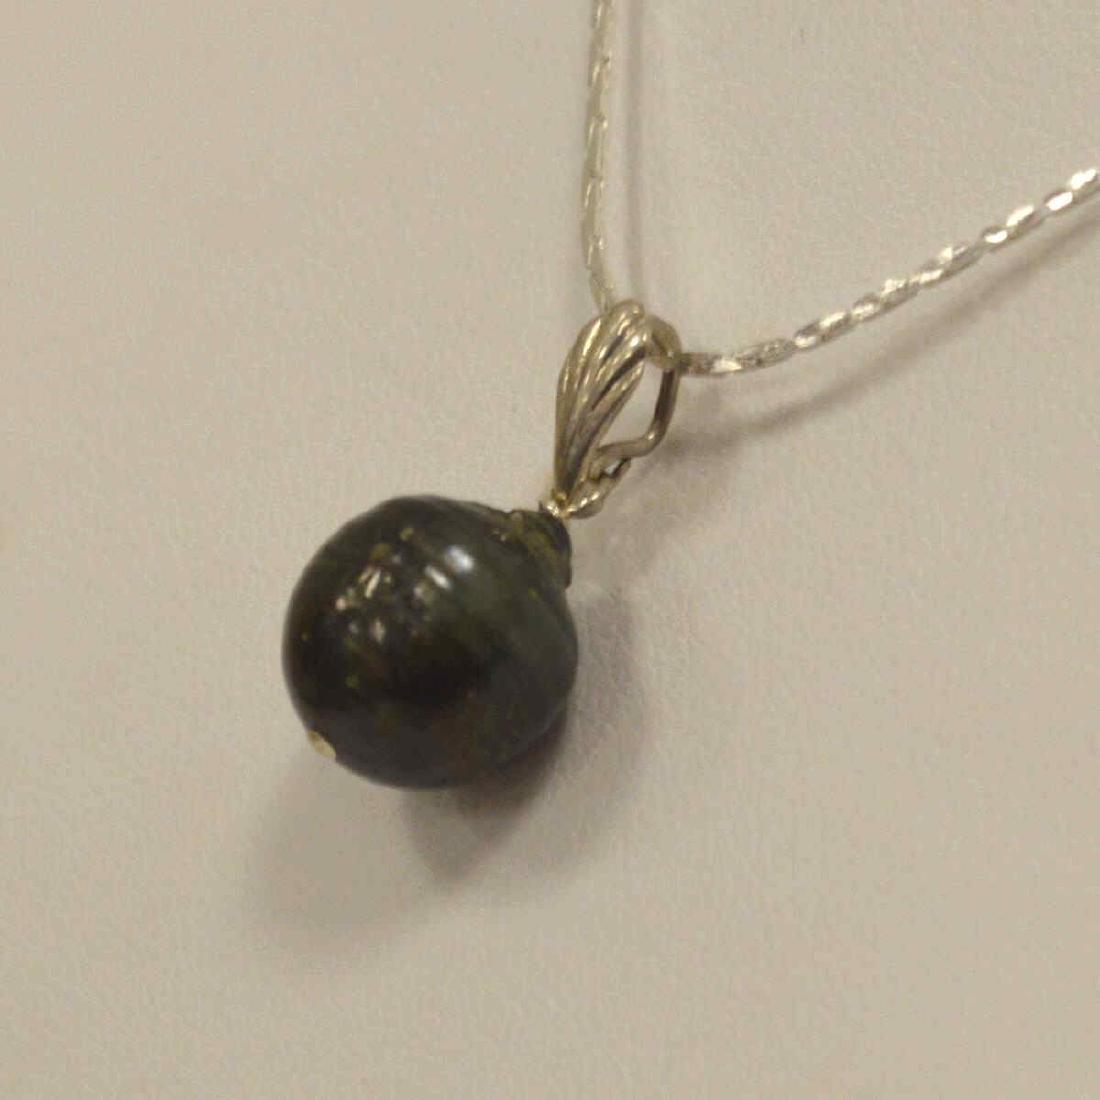 Sterling Silver Black South Sea Pearl Pendant - 4